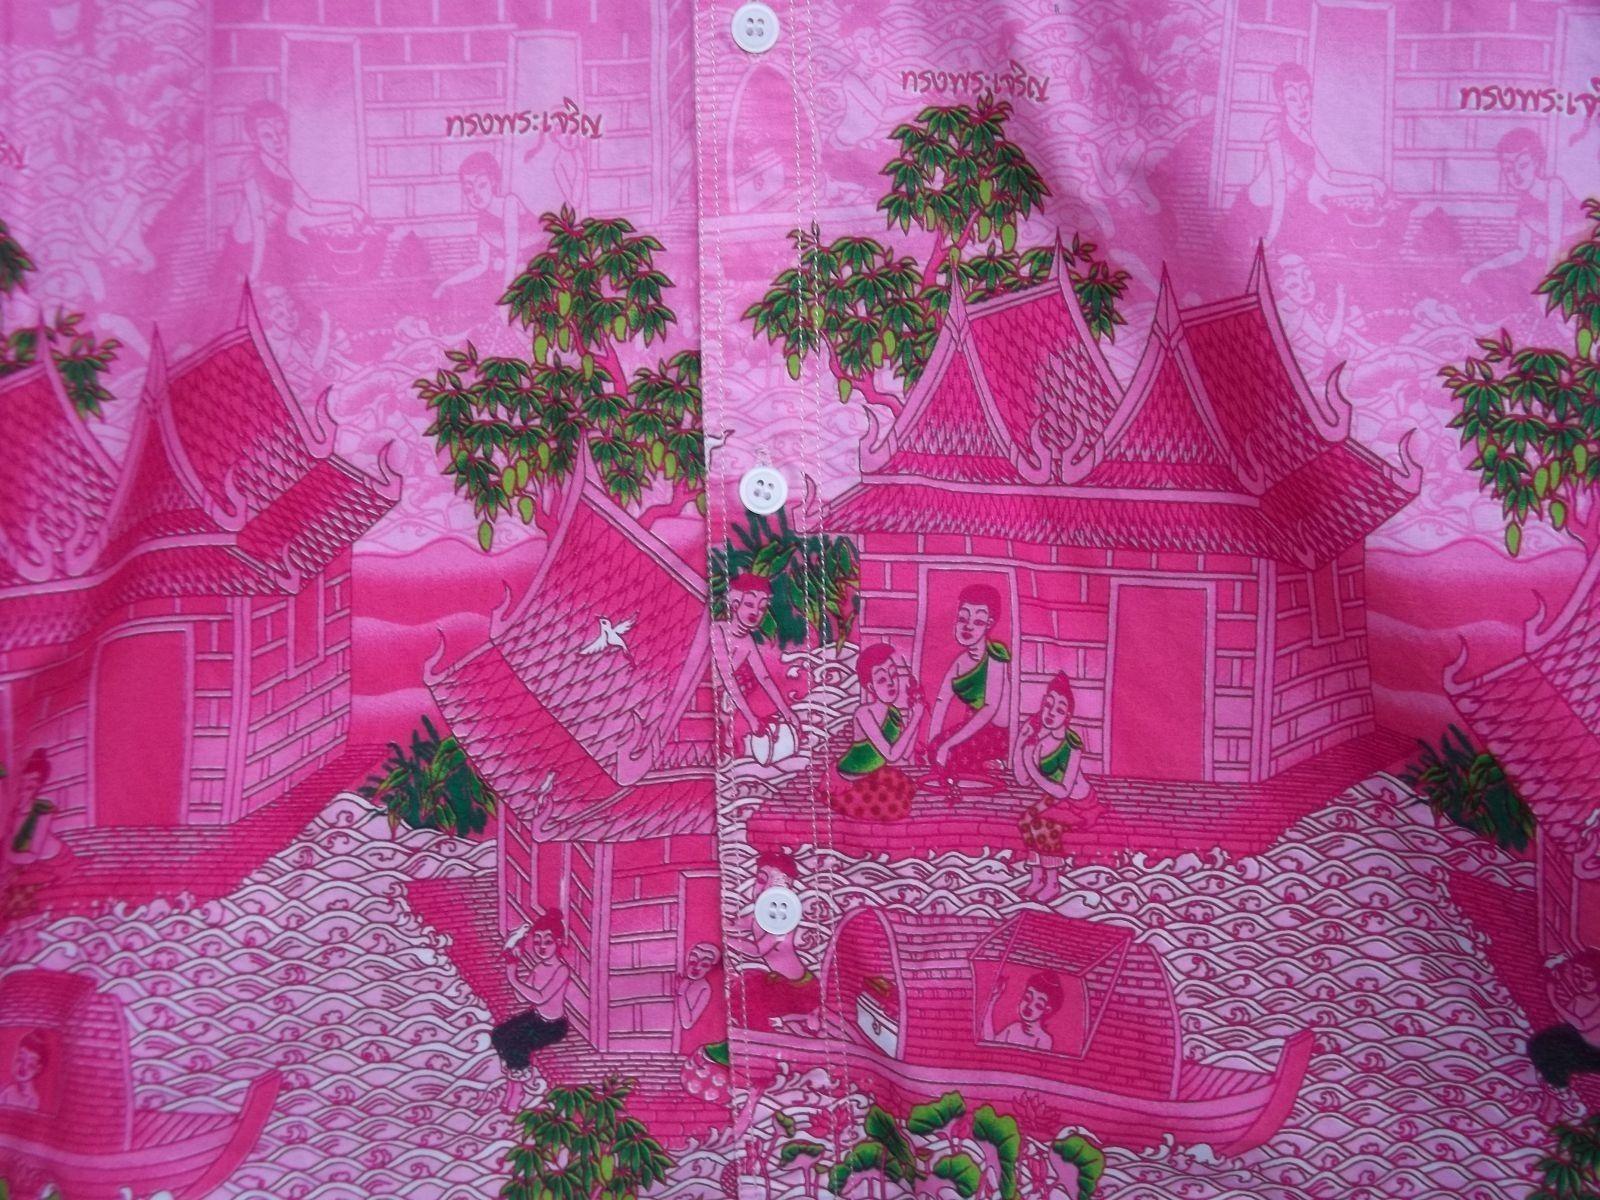 Real Men Wear Pink Shirt Thai Language Long Live The King  Long-Tail Boats